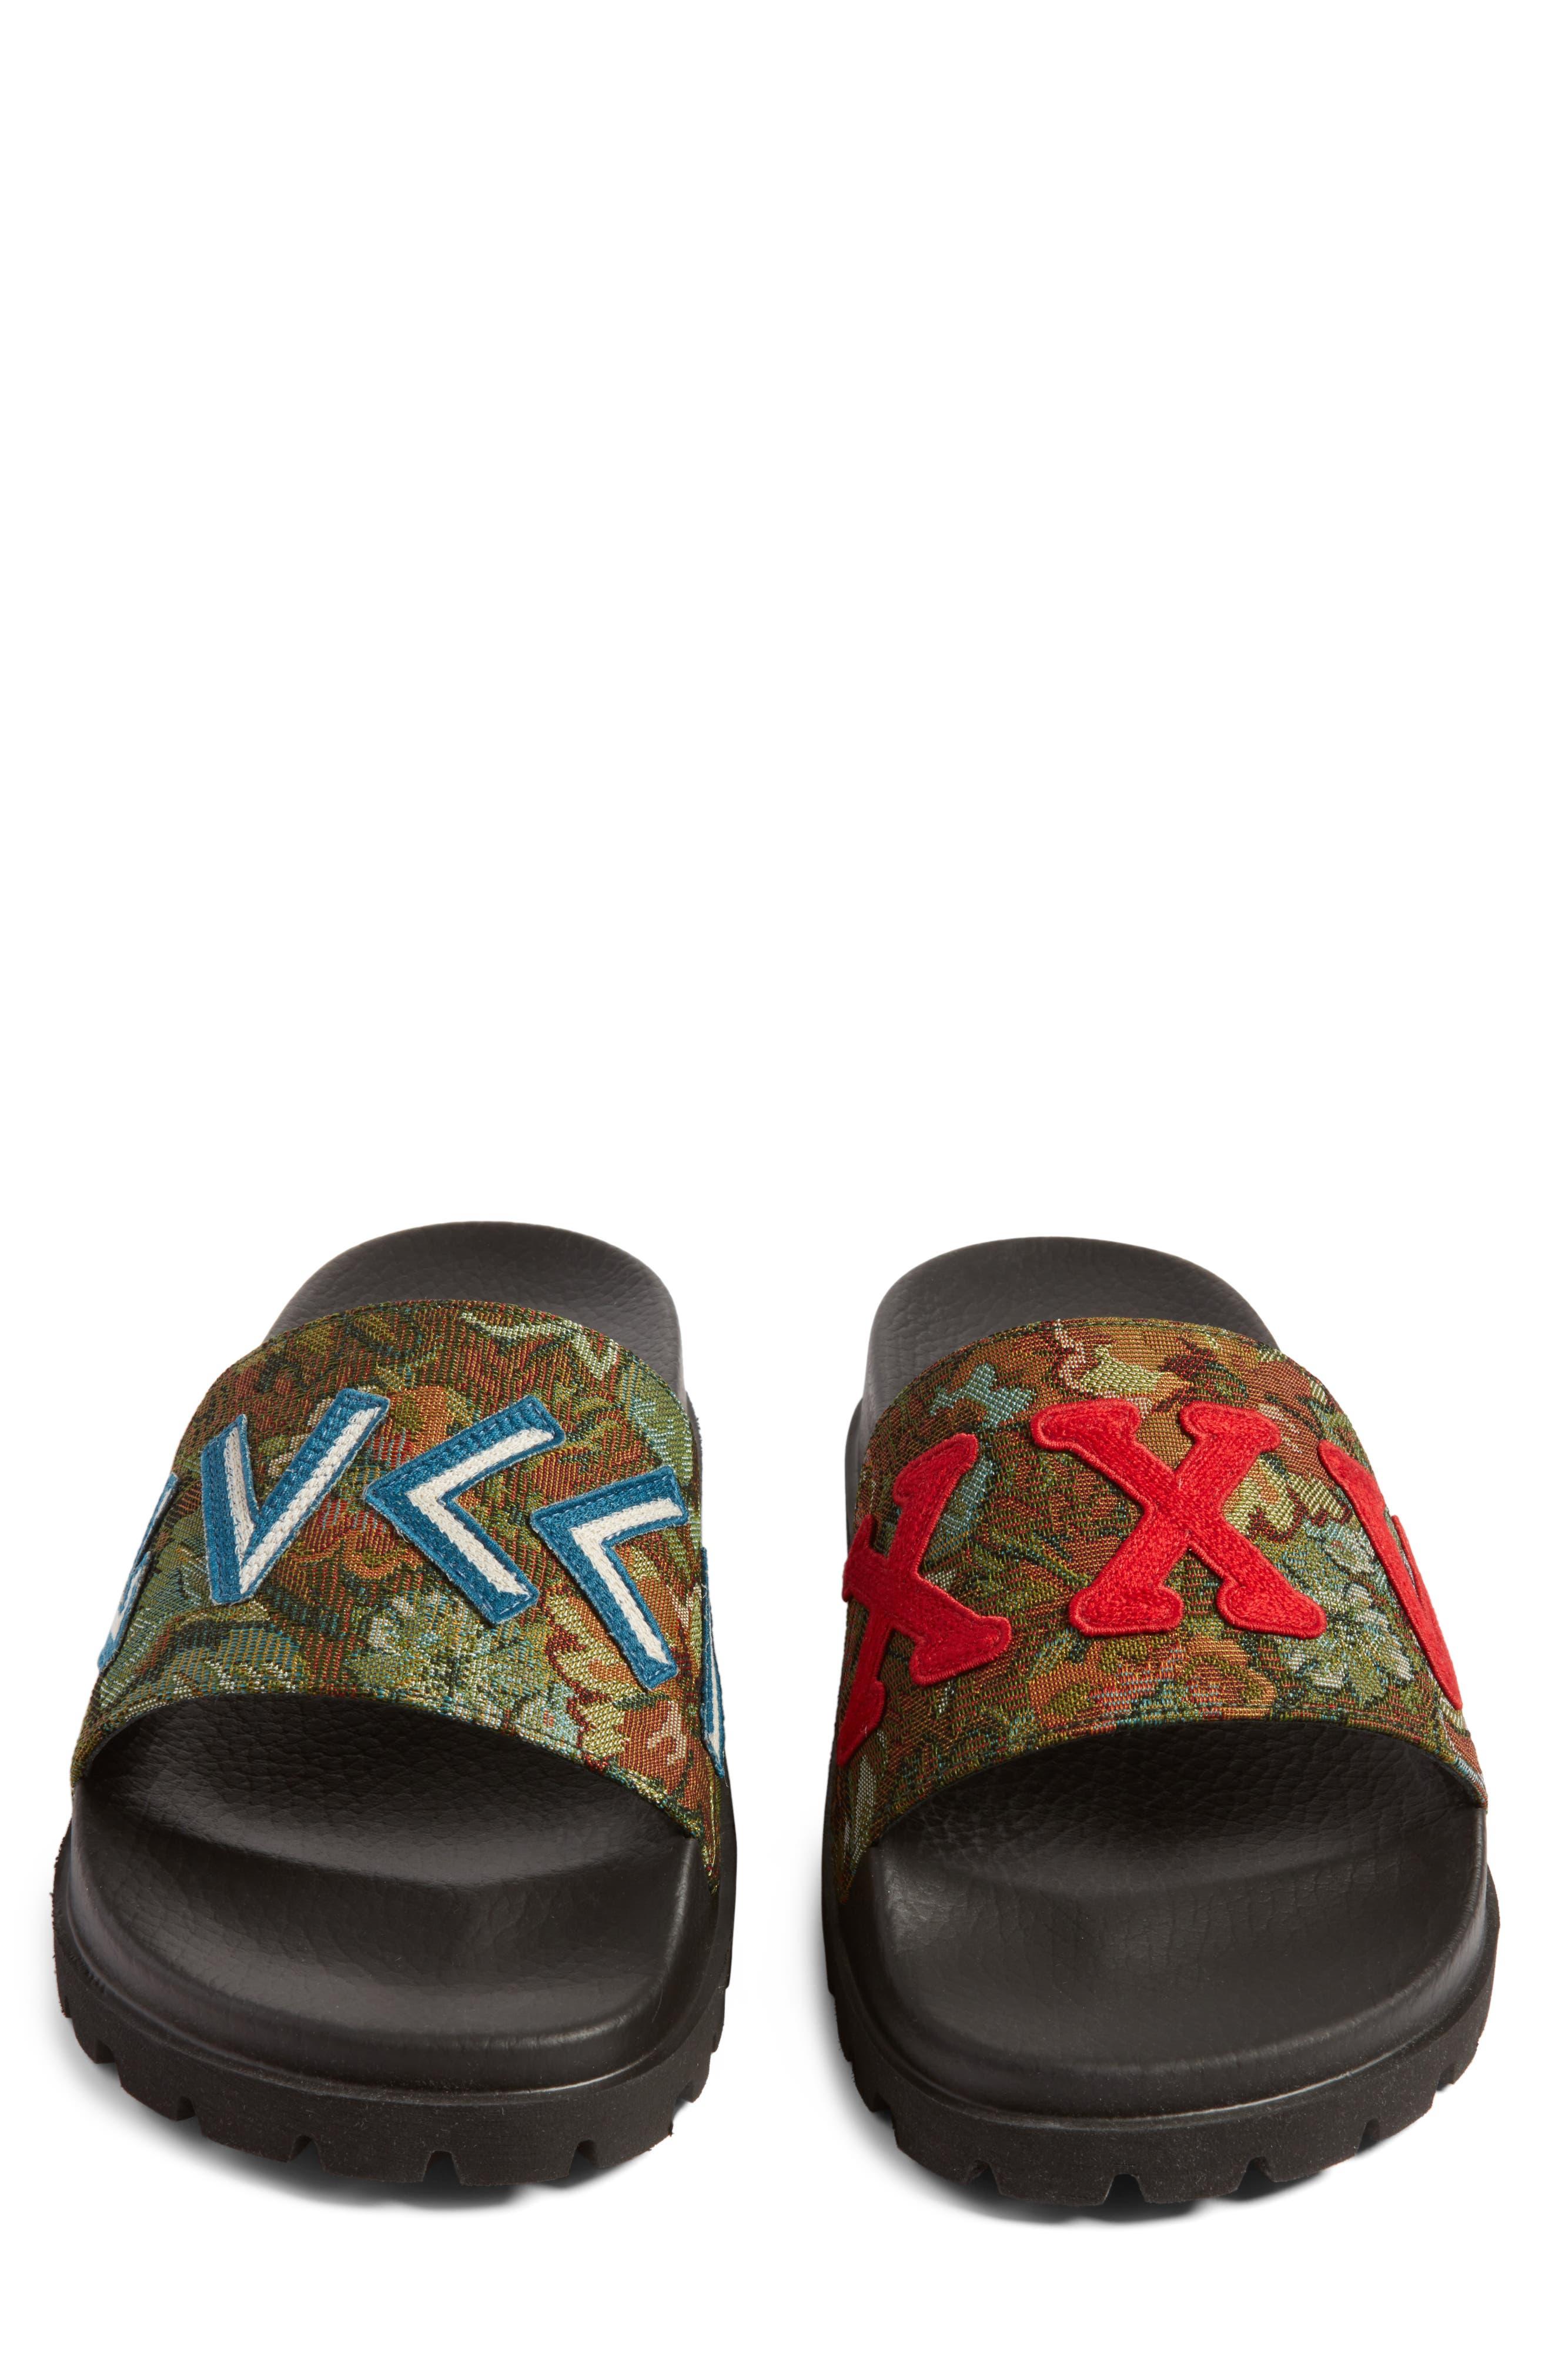 'Pursuit Treck' Slide Sandal,                             Alternate thumbnail 4, color,                             Green Multi